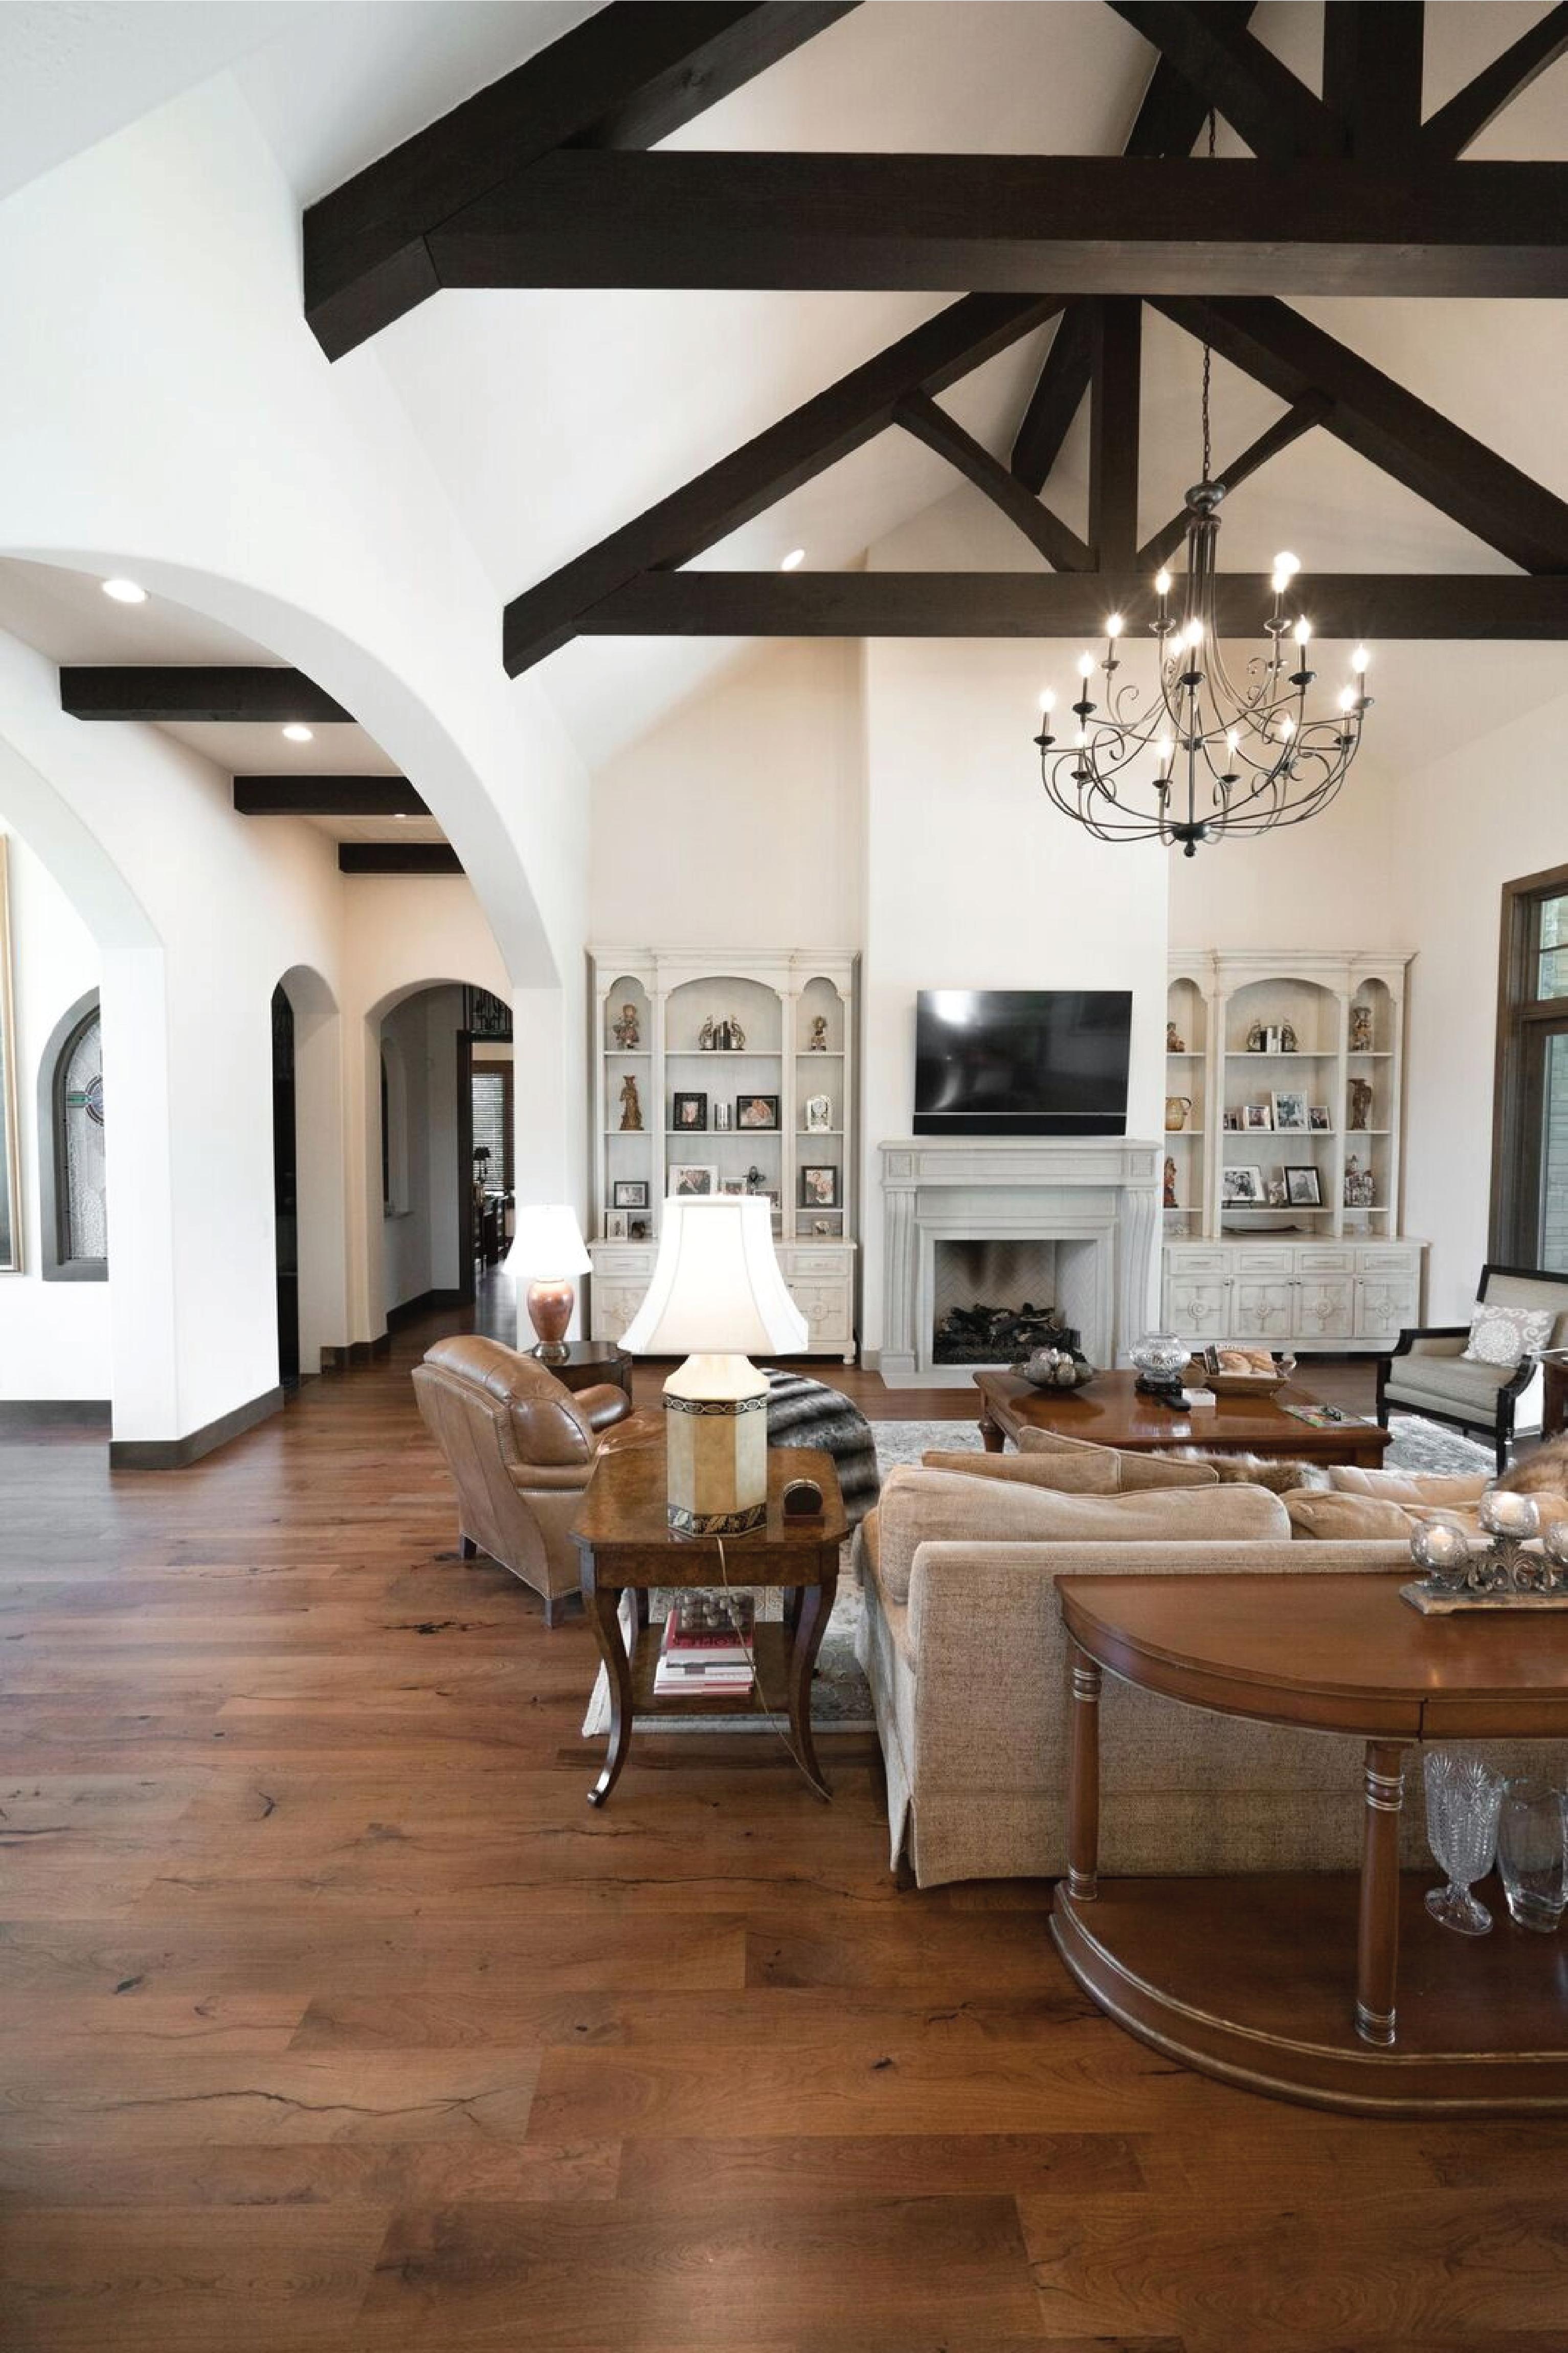 Austin Home With Texas Mesquite Hardwood Floors Living